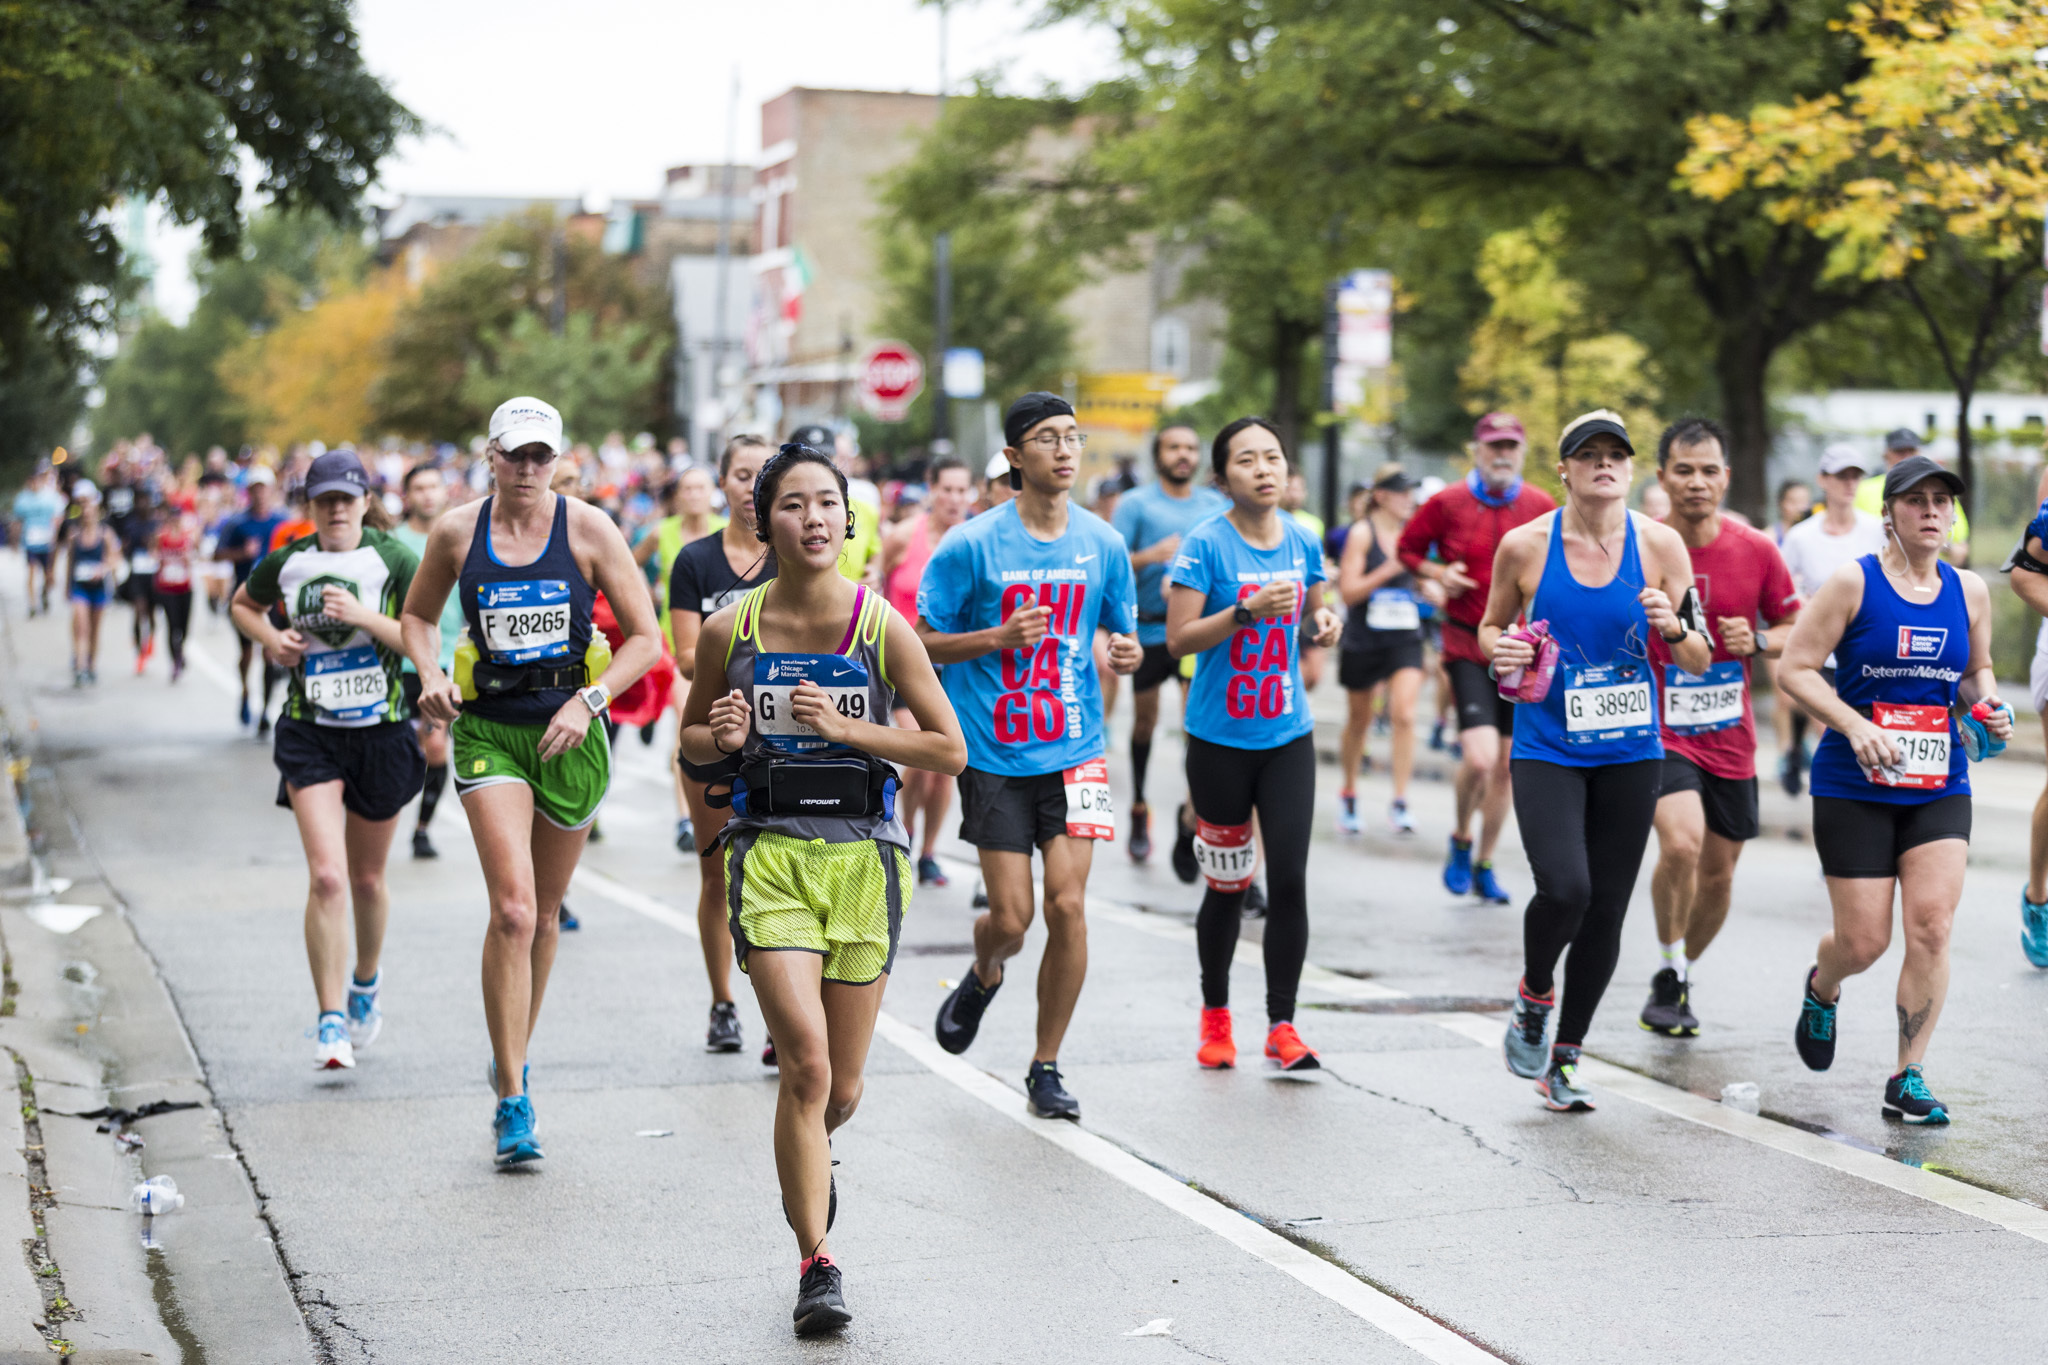 maraton chicago 2019 inscripciones